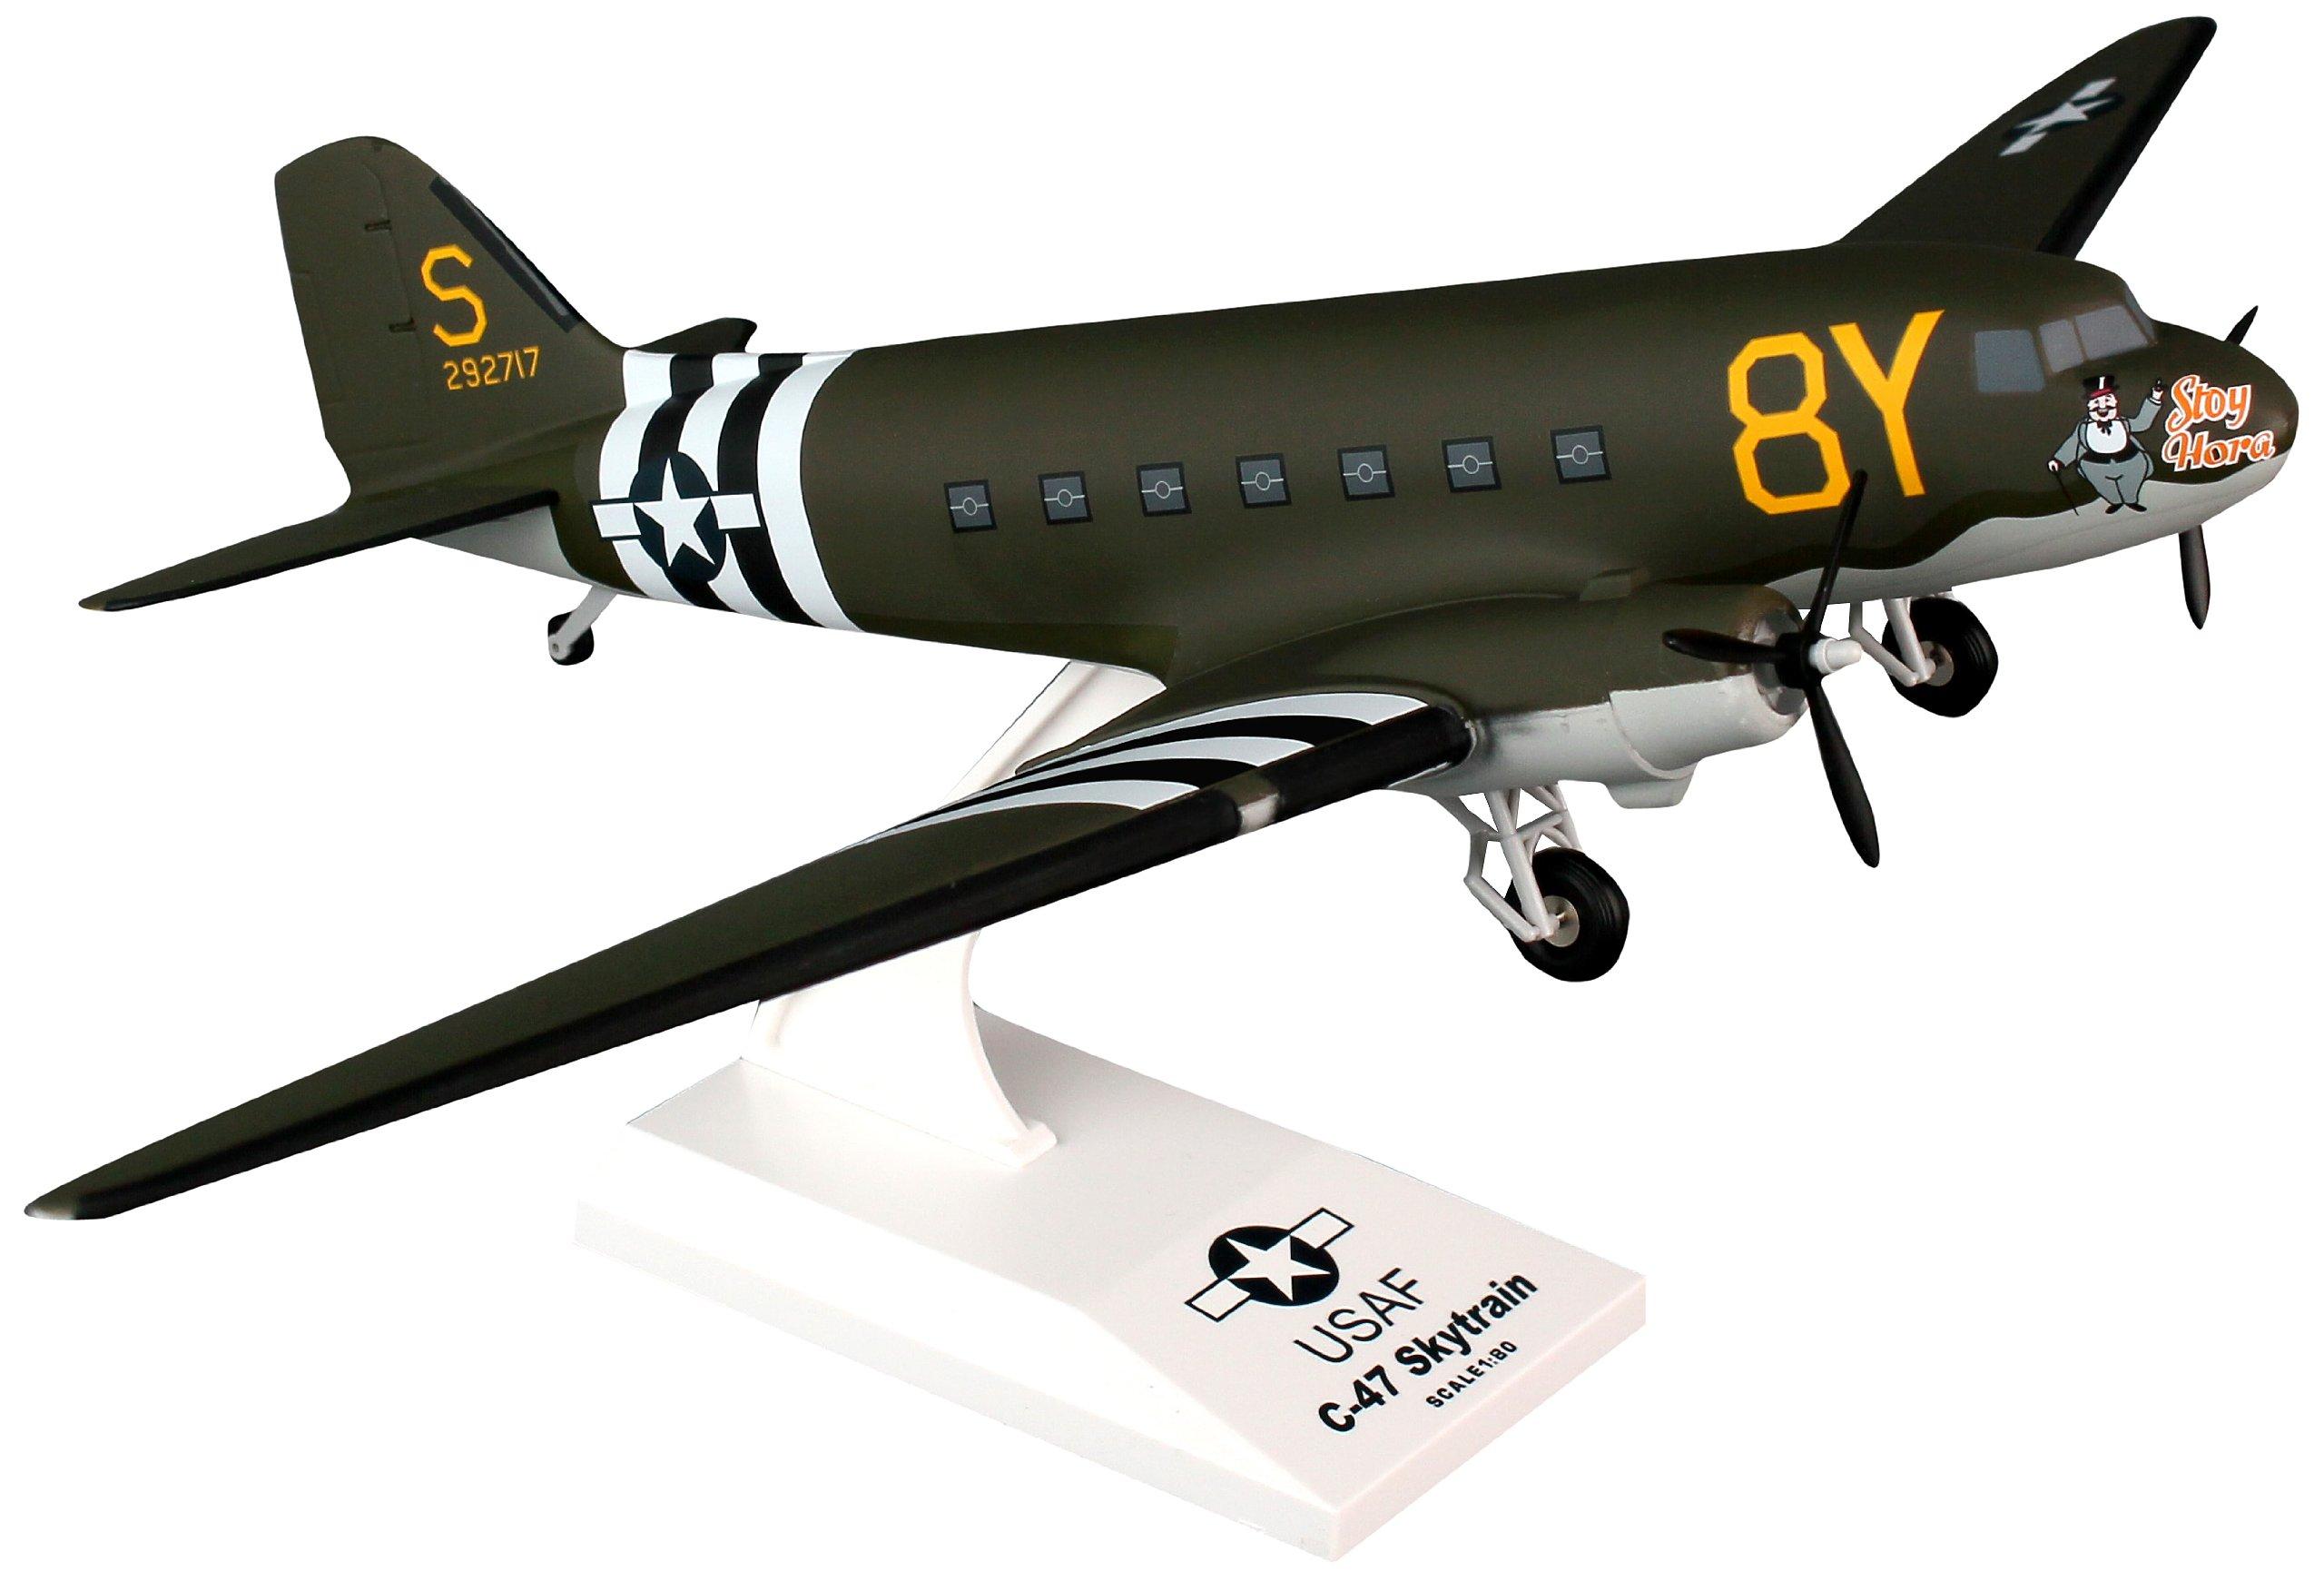 Daron Skymarks C-47 Stoy Hora Model Kit (1/80 Scale)